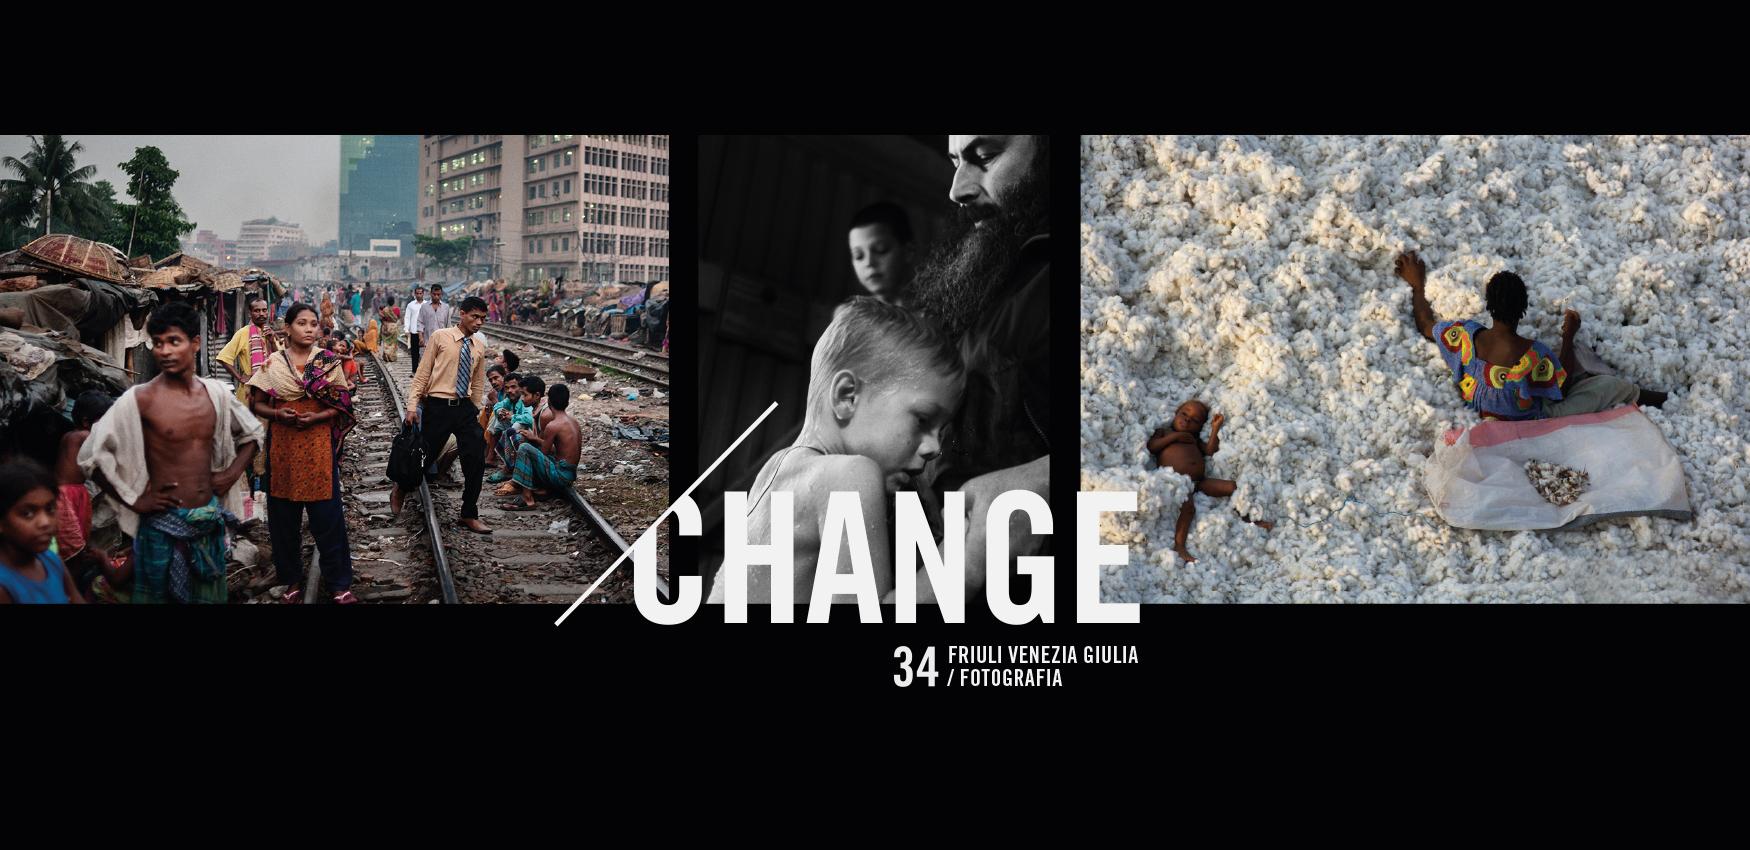 Friuli Venezia Giulia Fotografia - #CHANGE